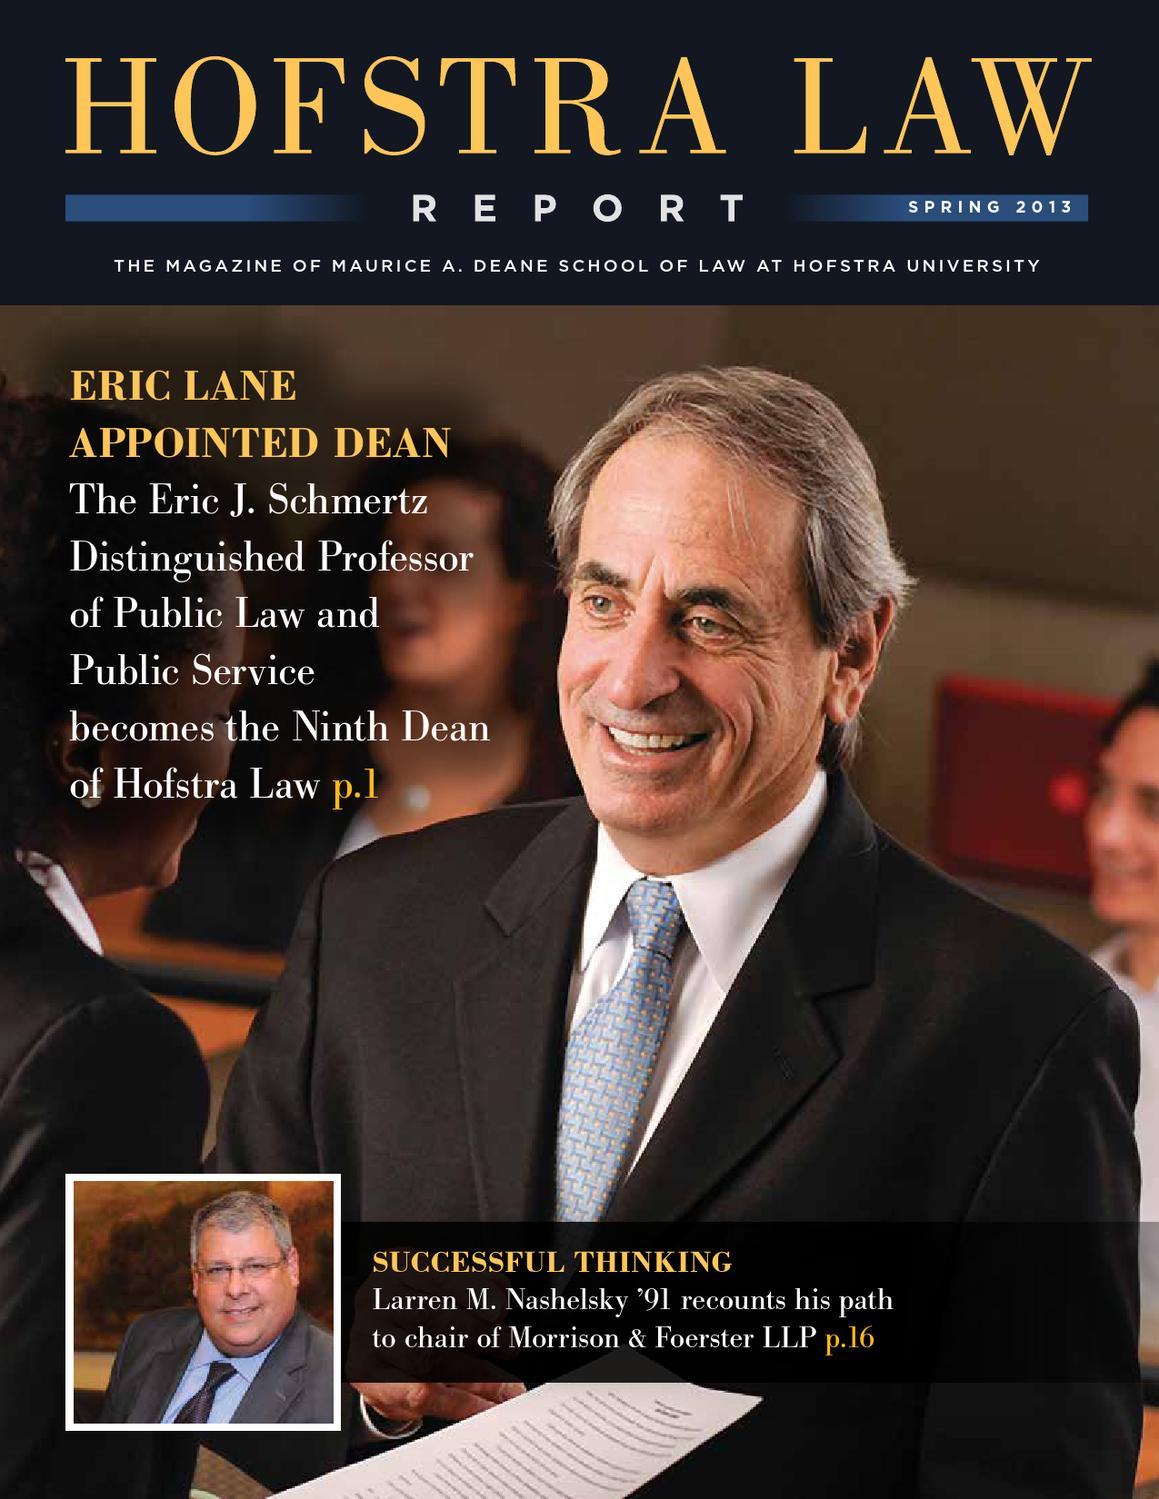 Elegant Hofstra Law Report, Spring 2013 By Hofstra Law School   Issuu